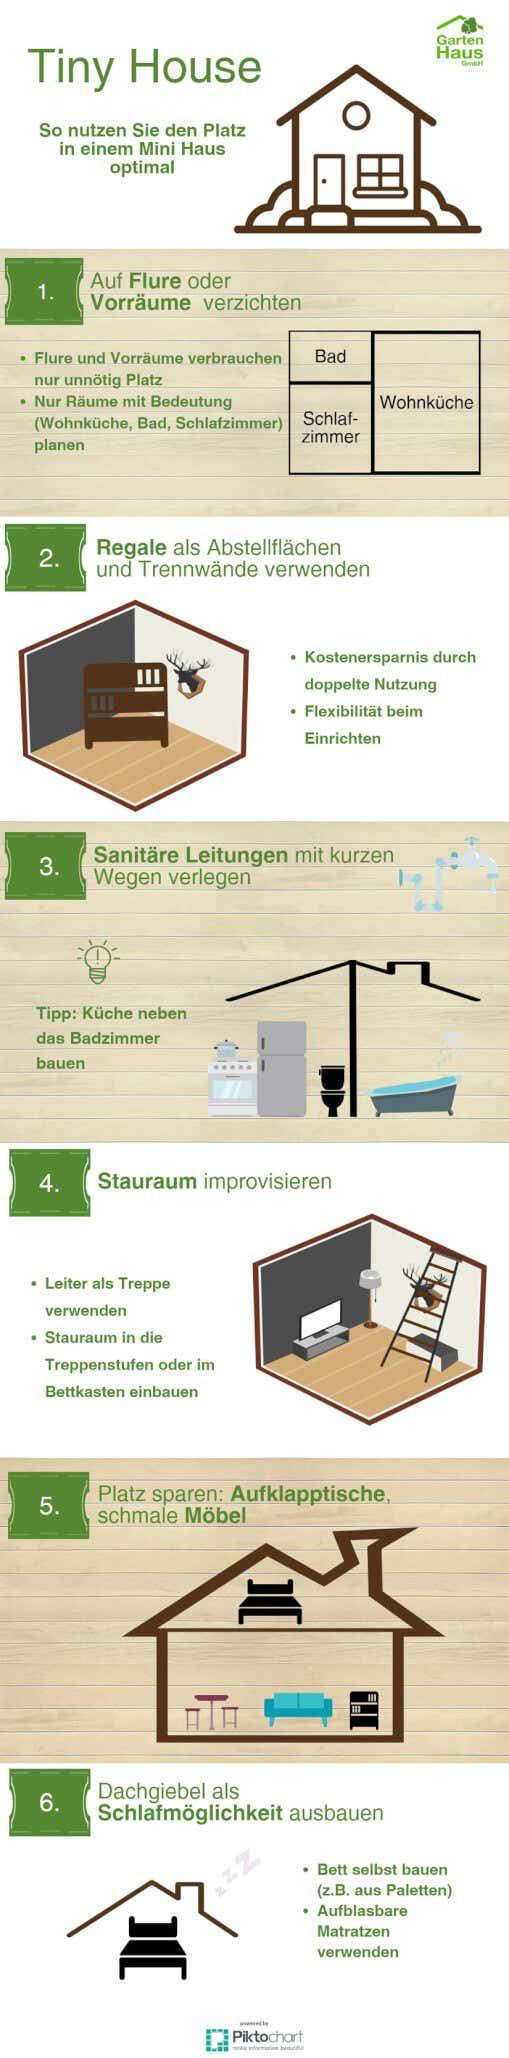 Tiny House Selber Bauen Planung Baugenehmigung Kosten